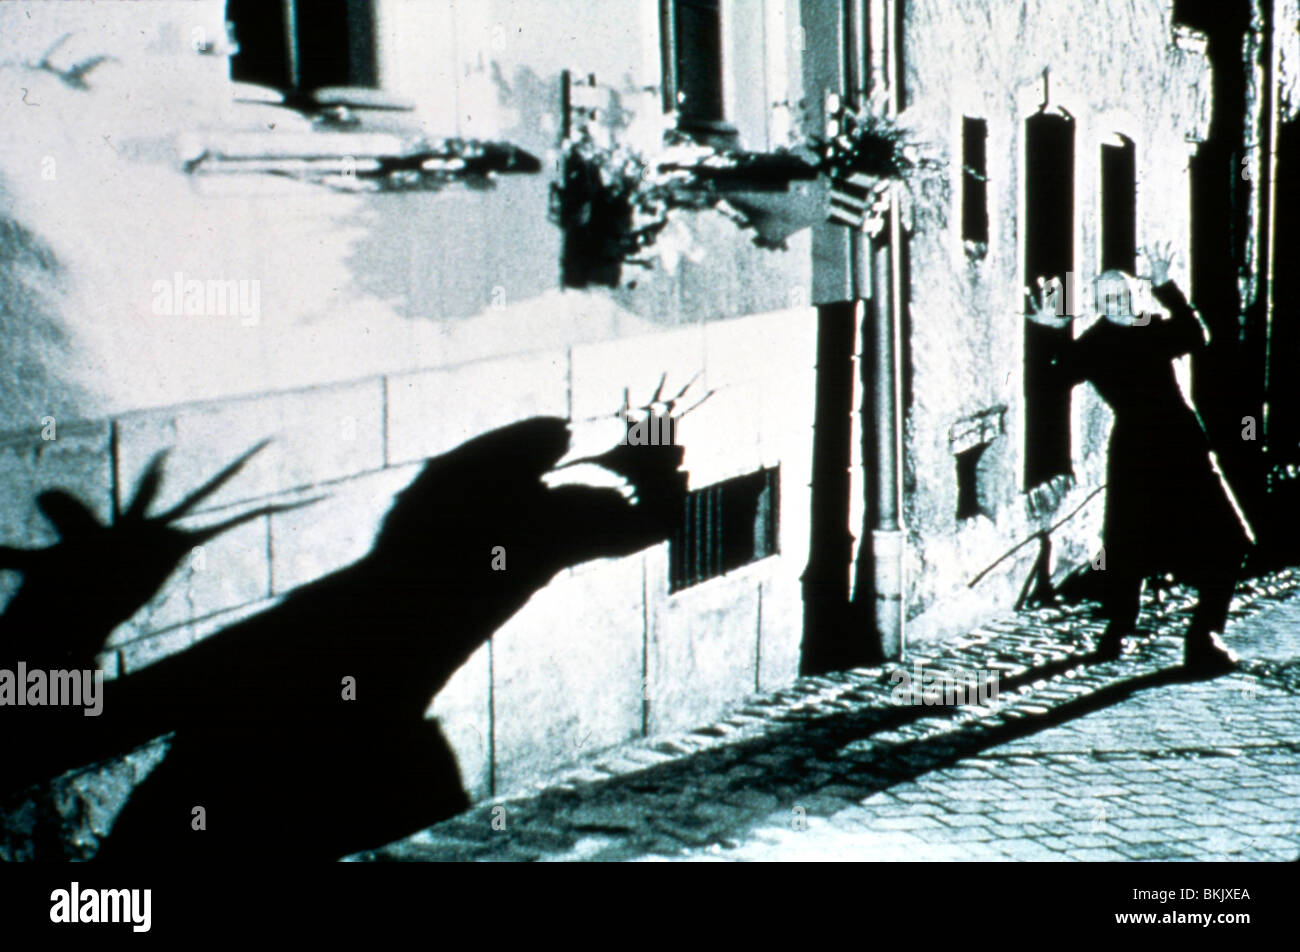 Ombra del vampiro (2000) Willem Dafoe SHVA 063 Immagini Stock